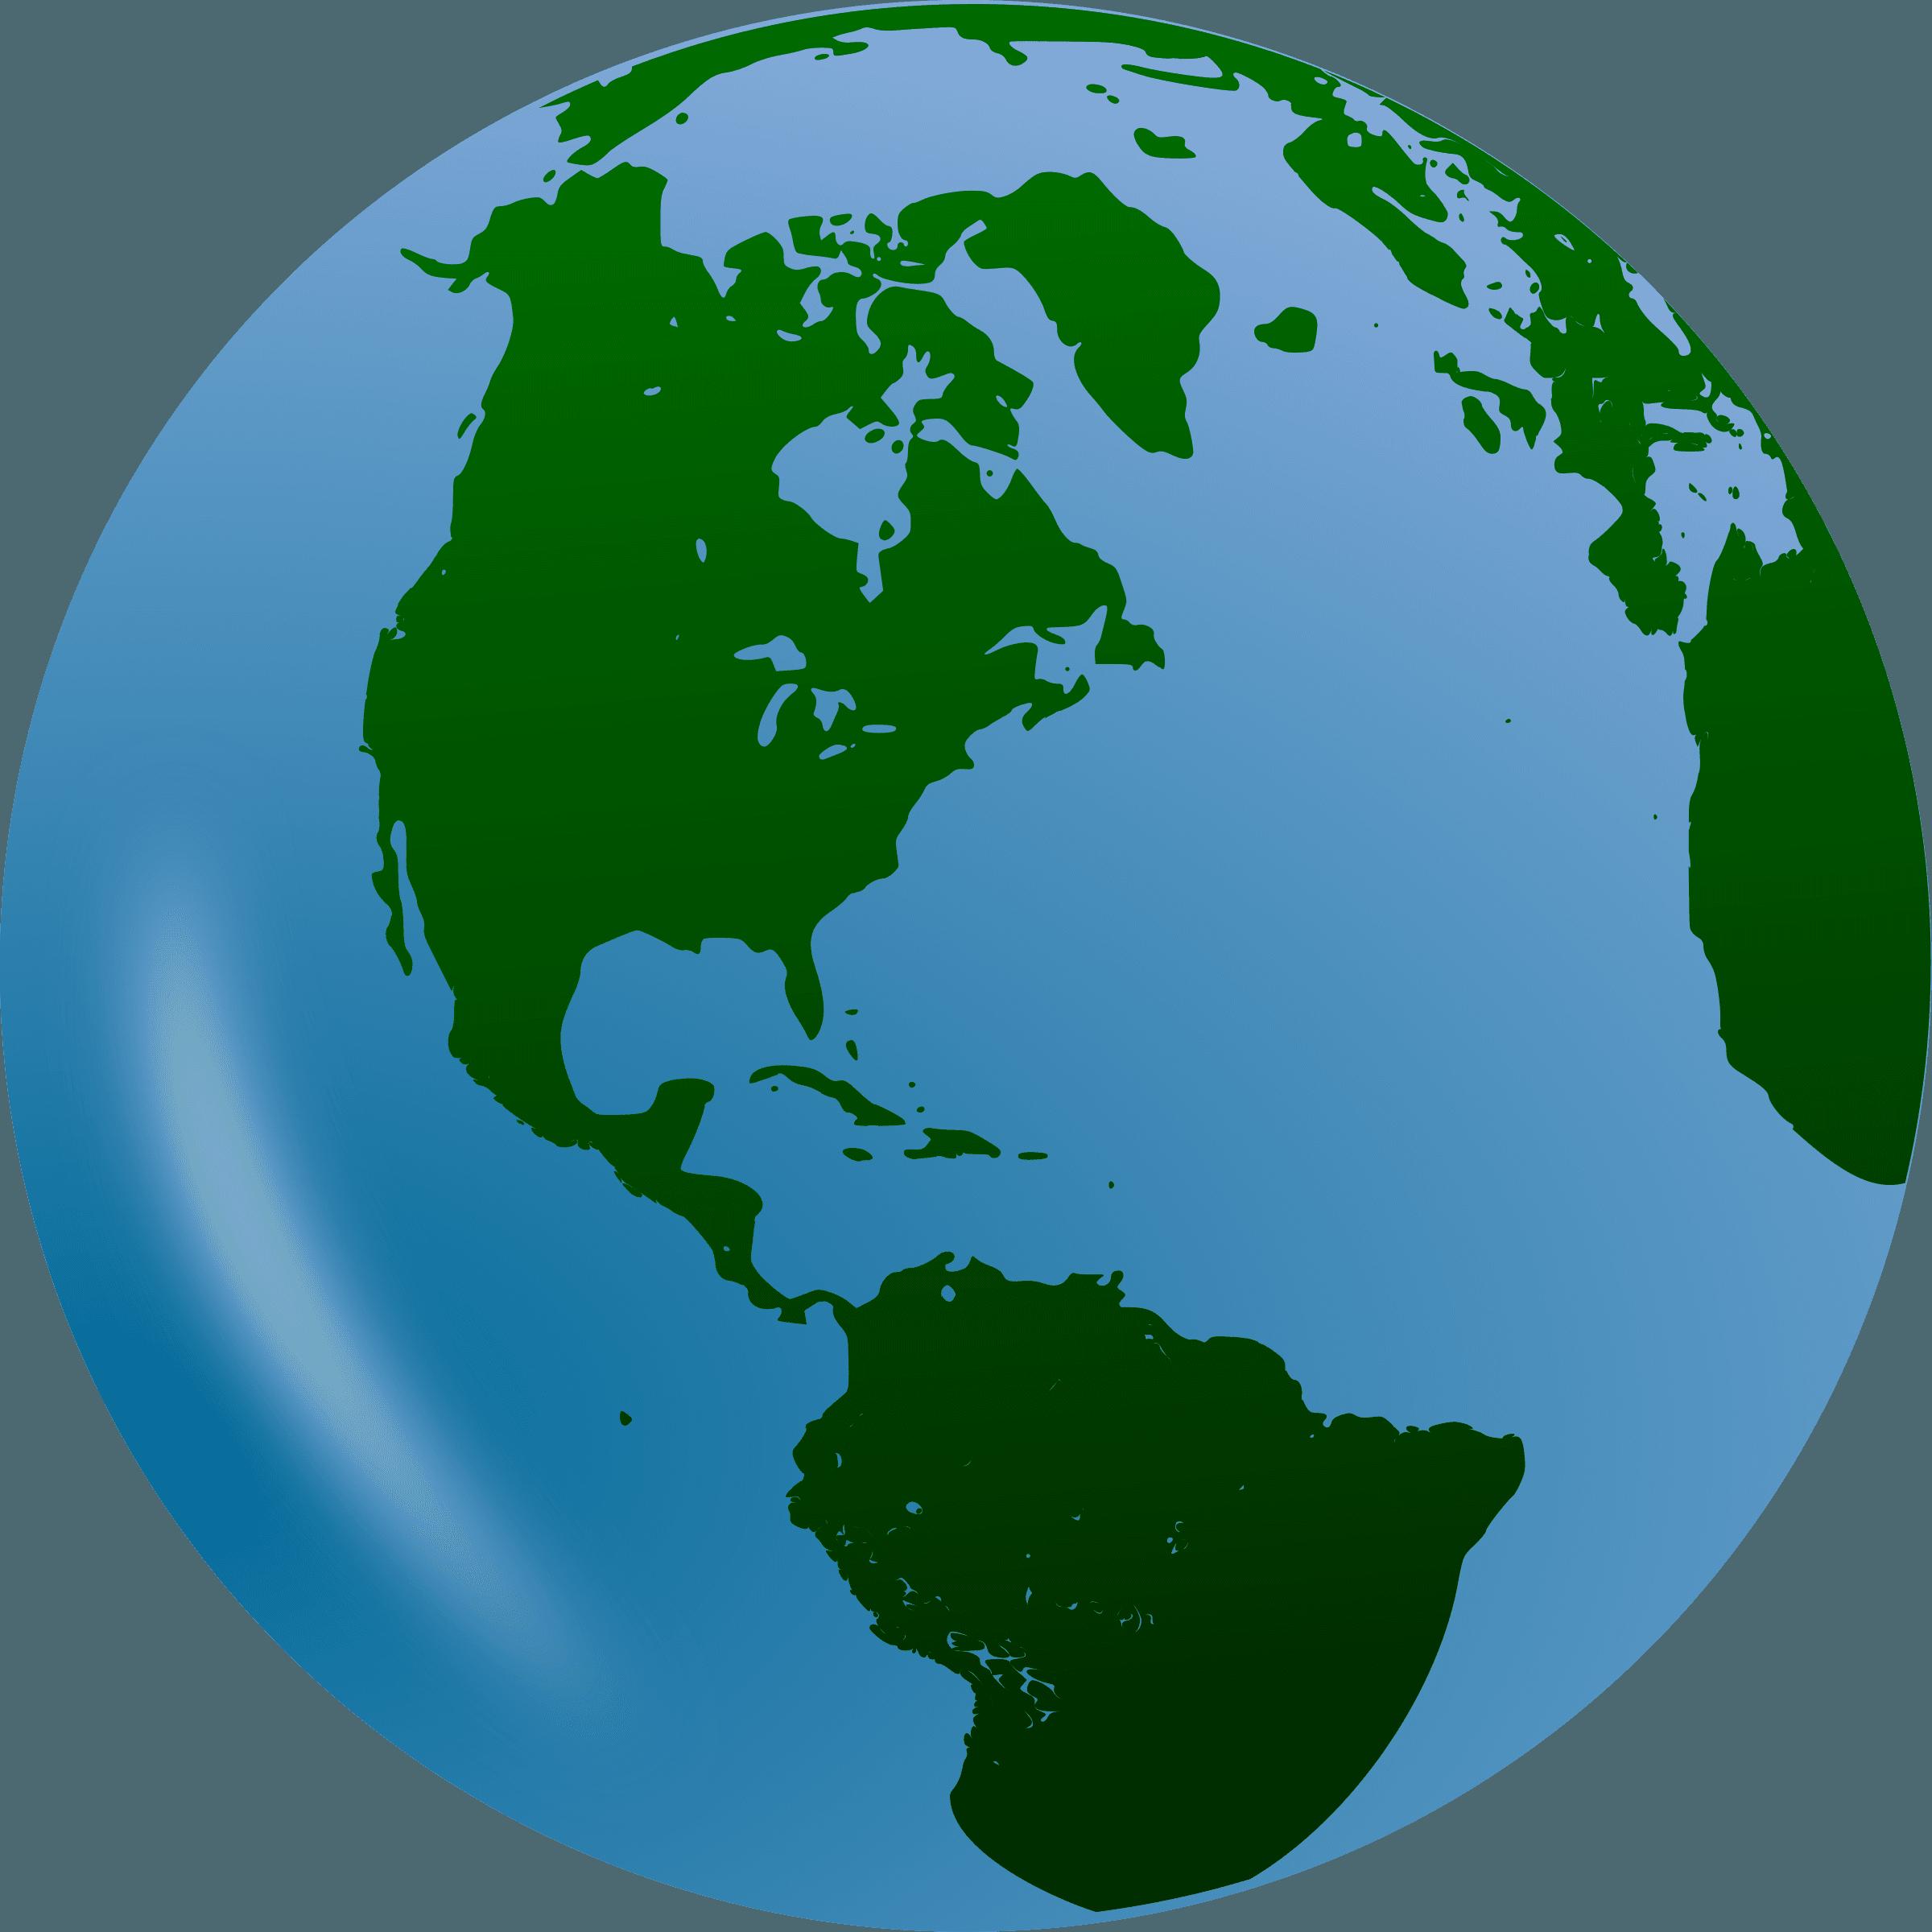 2400x2400 World Clip Art Globe Free Clipart Images 3